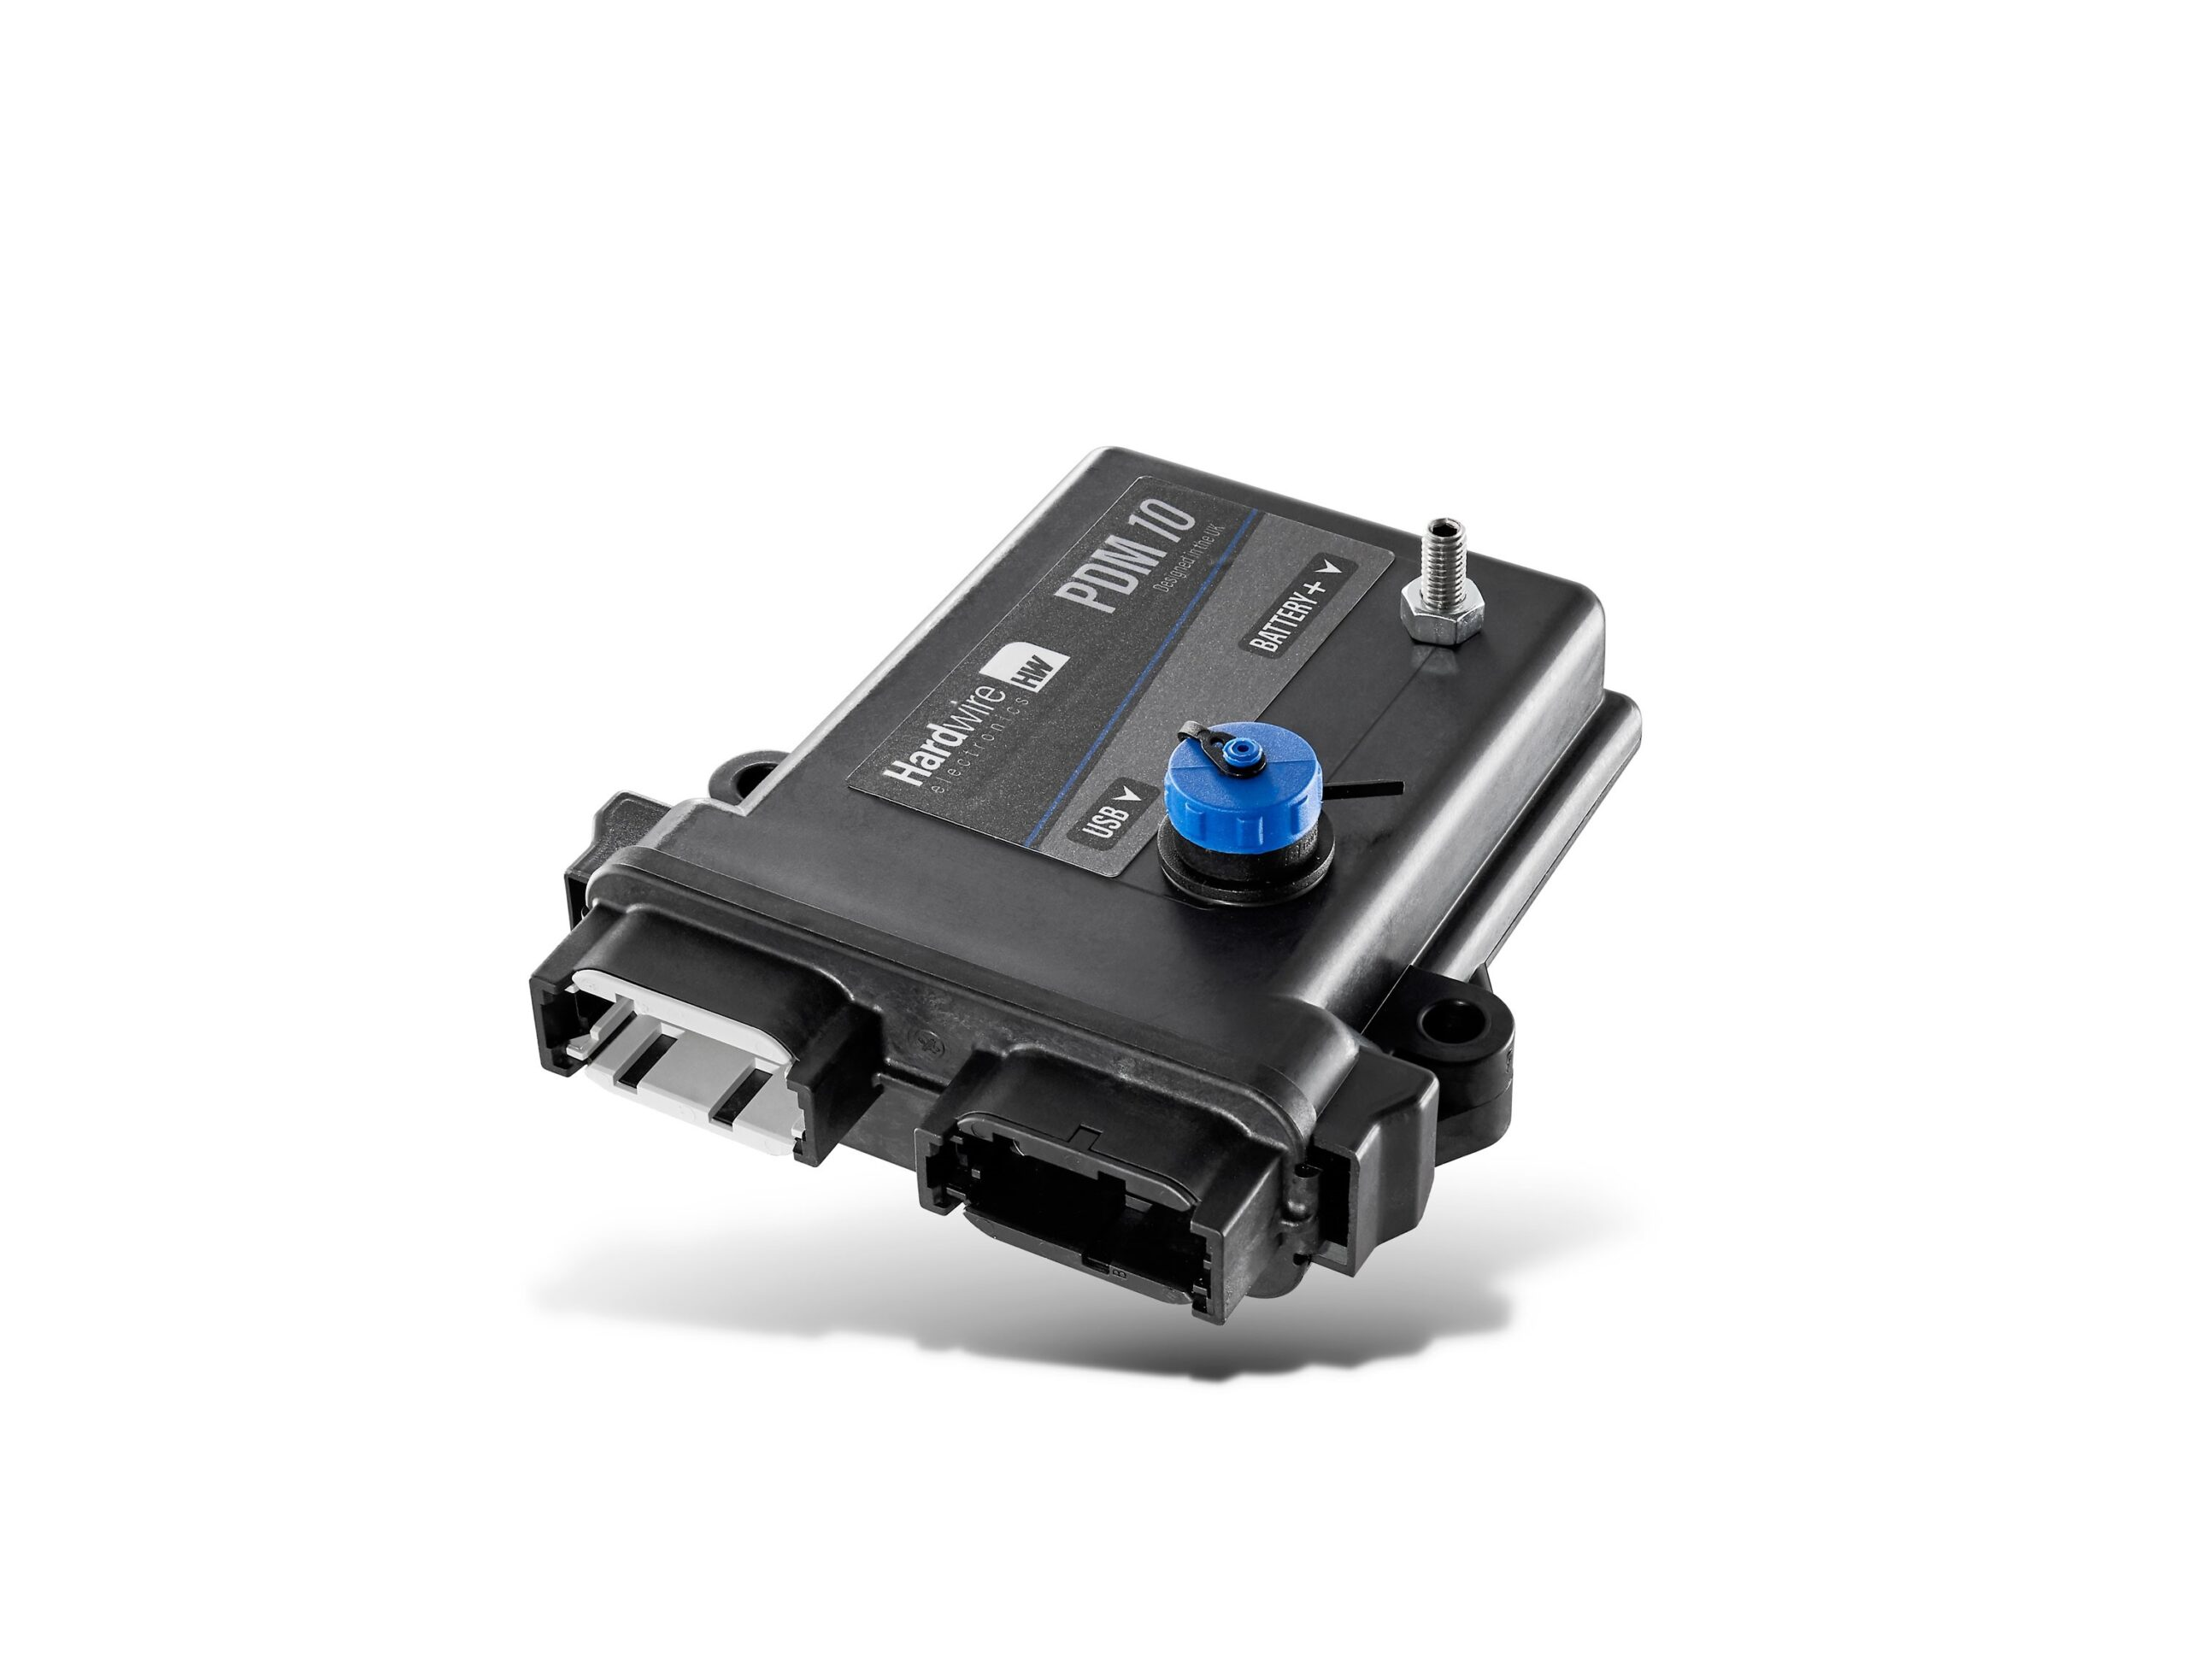 Hardwire PDM10